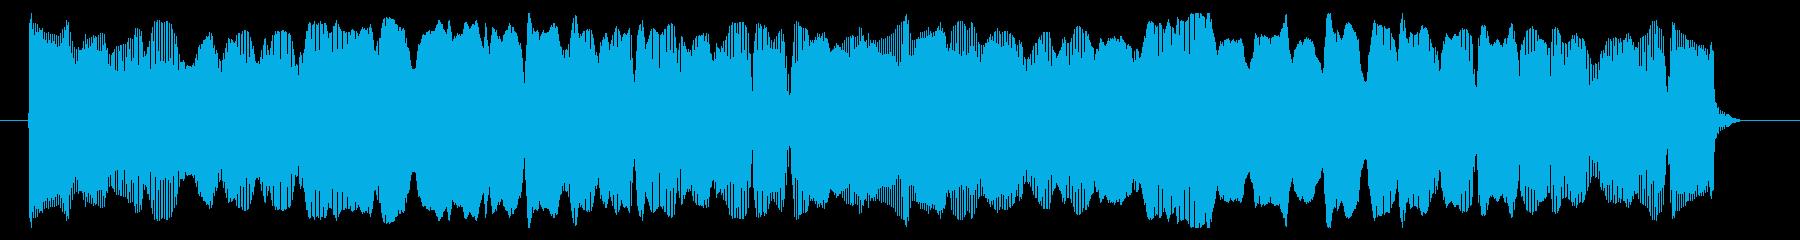 8bitパワーU-D-01-3_dryの再生済みの波形